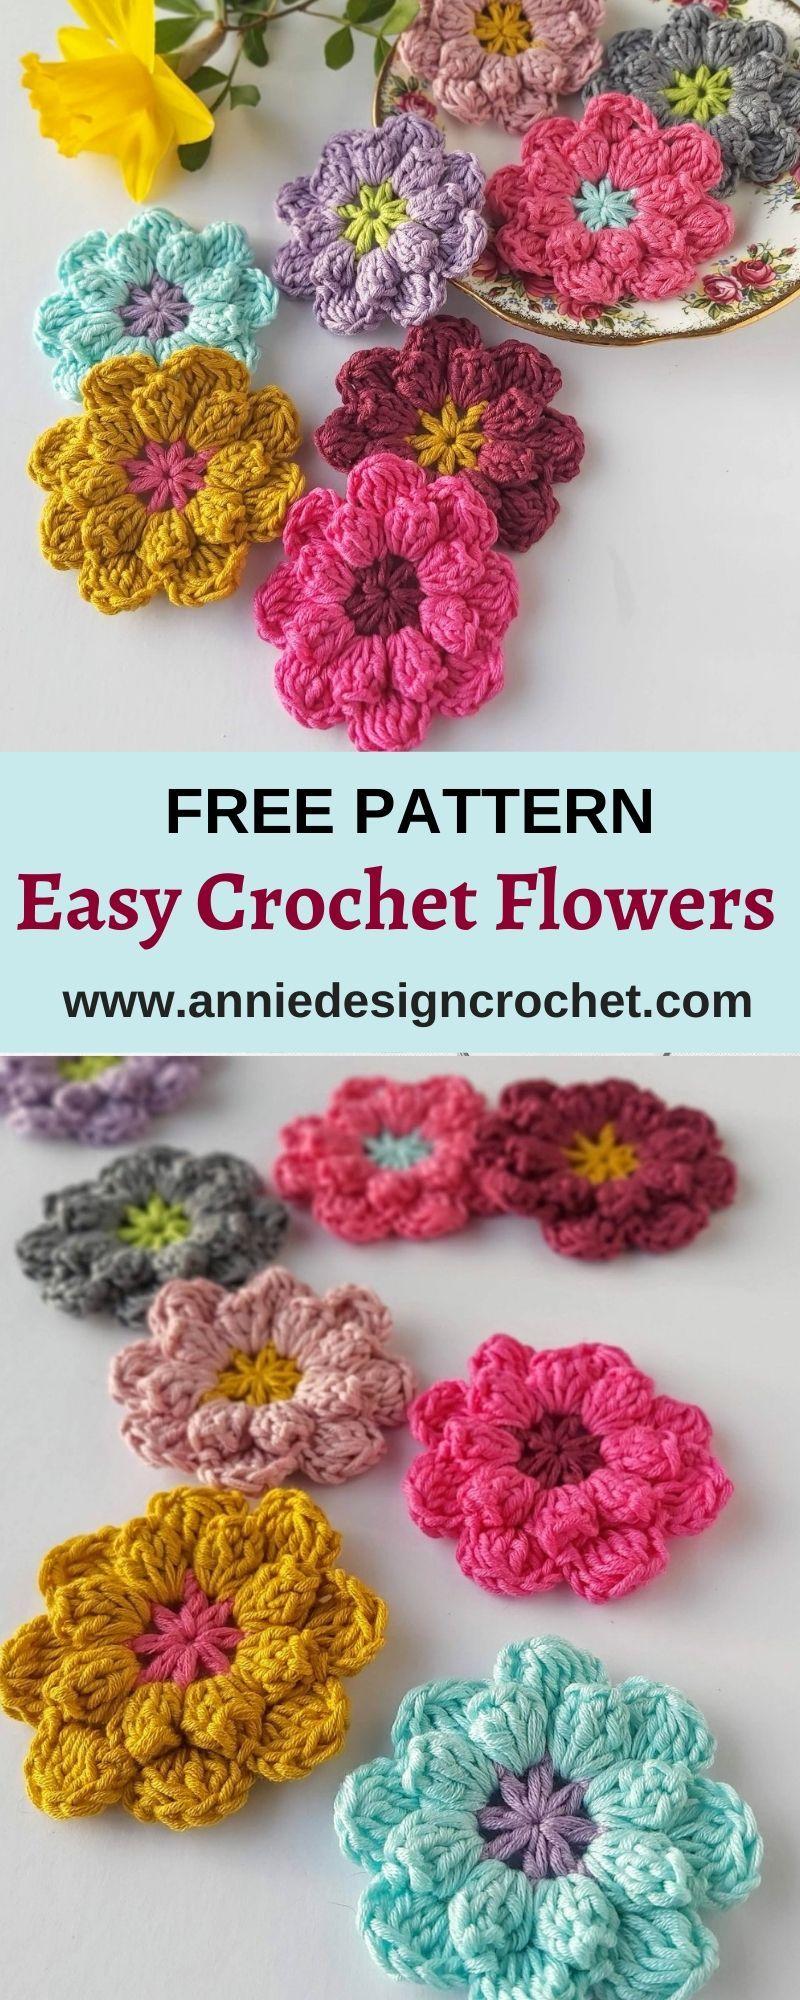 Photo of How to make Easy Crochet Flowers – Annie Design Crochet